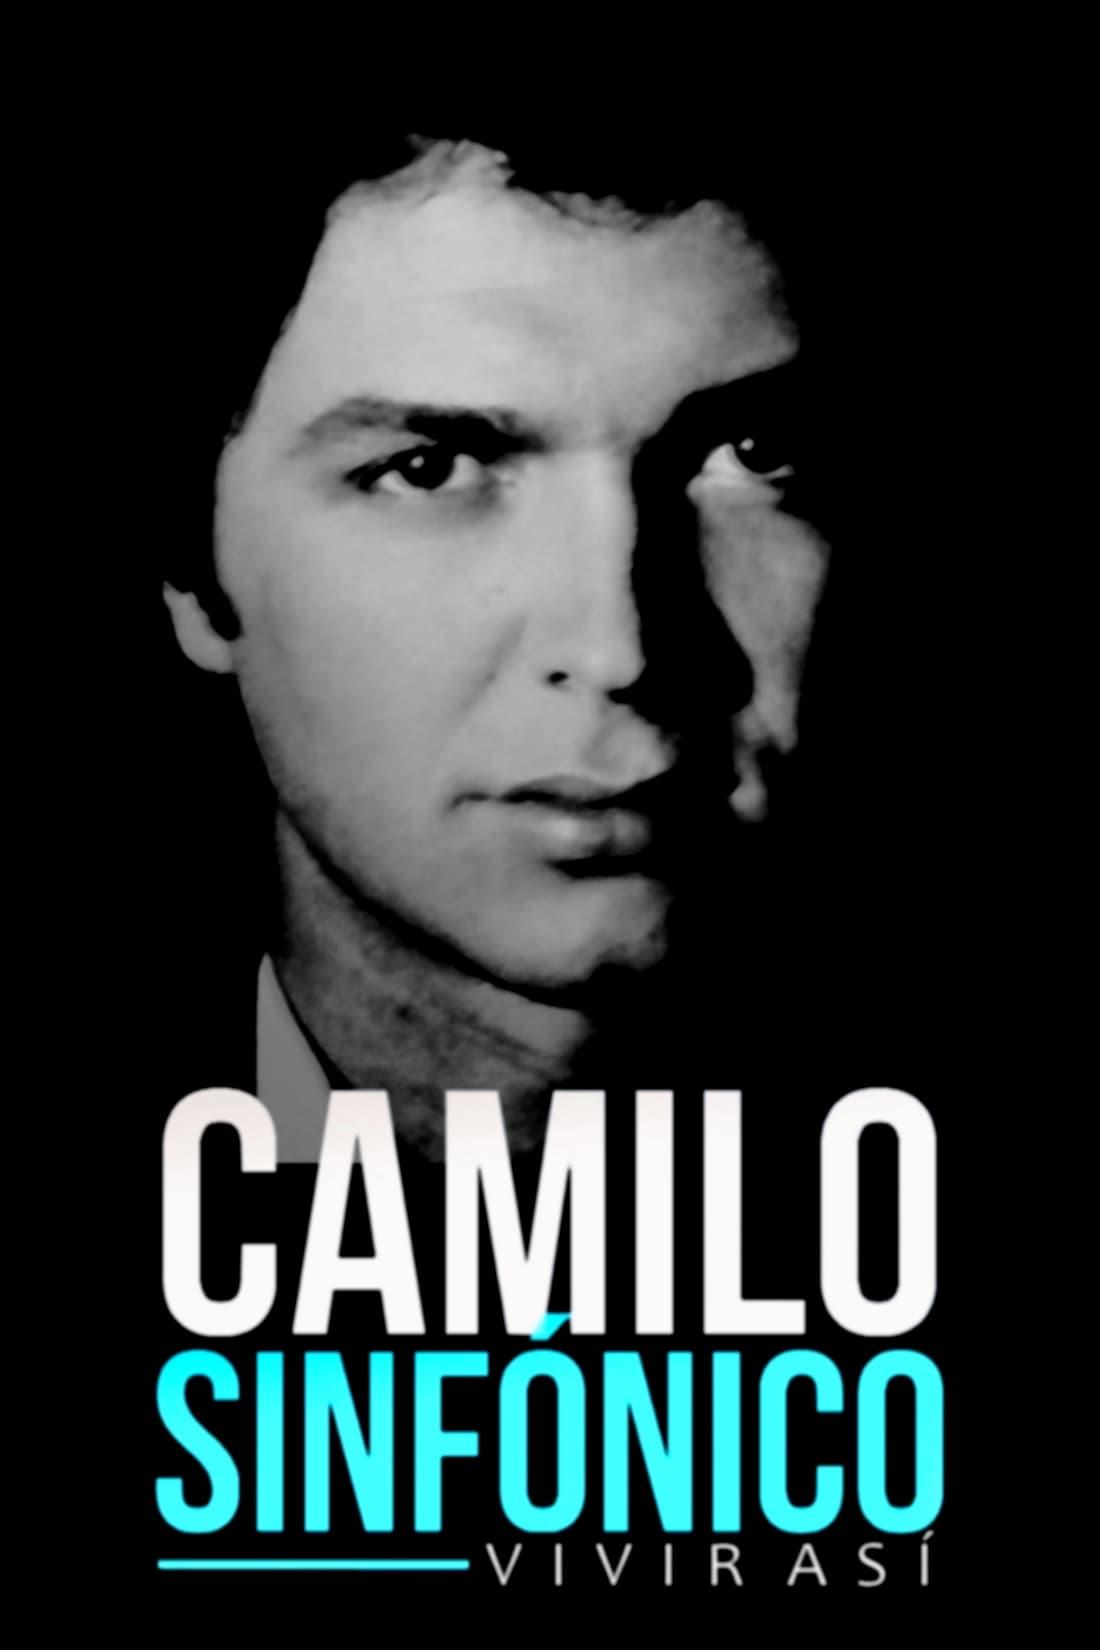 Camilo sinfónico: vivir así (2019)